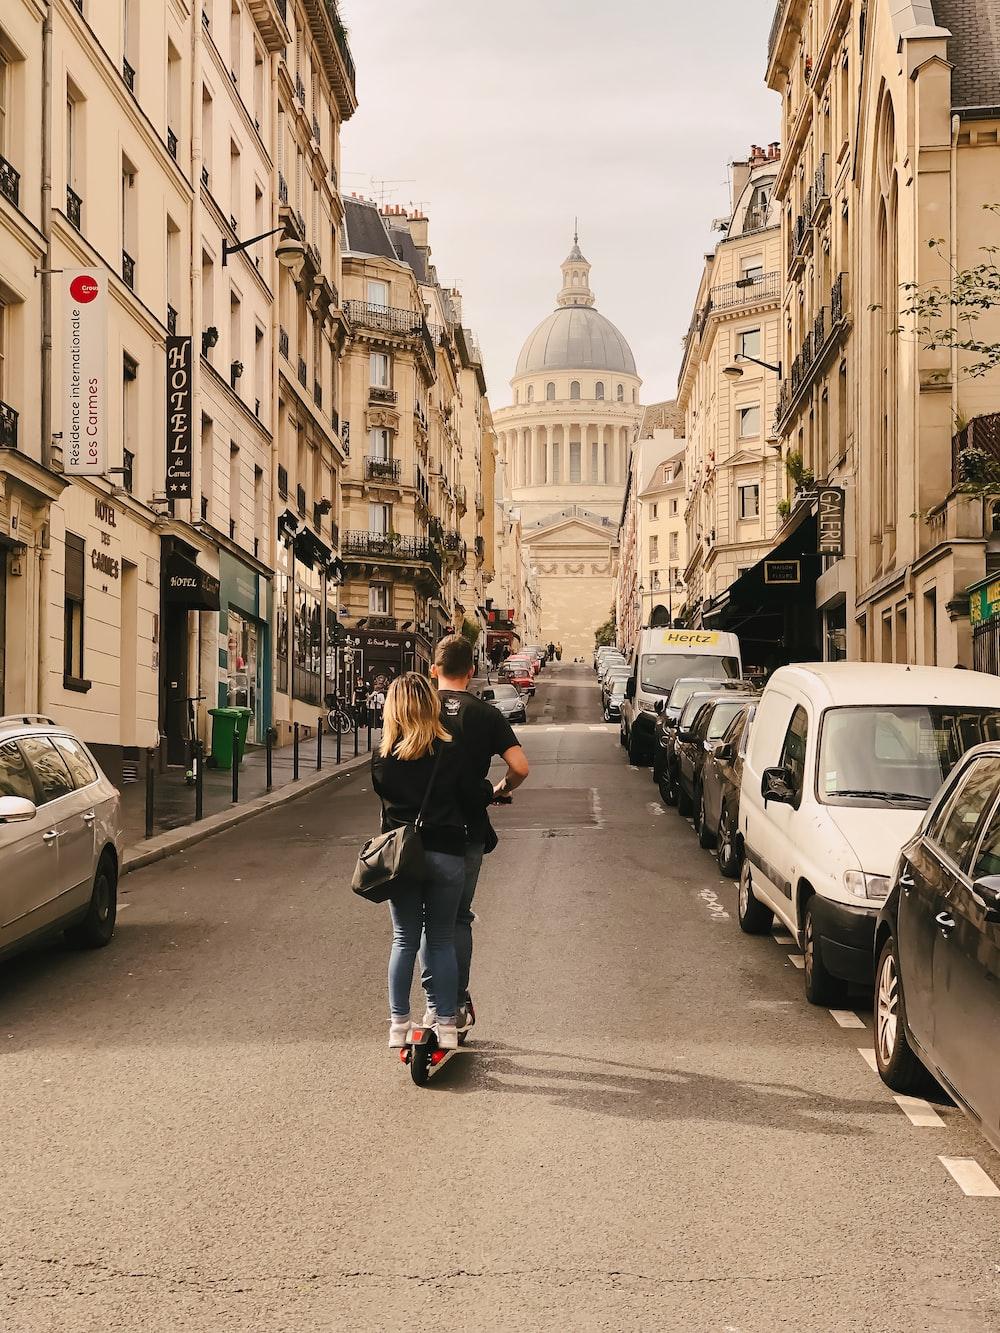 man and woman riding kick scooter